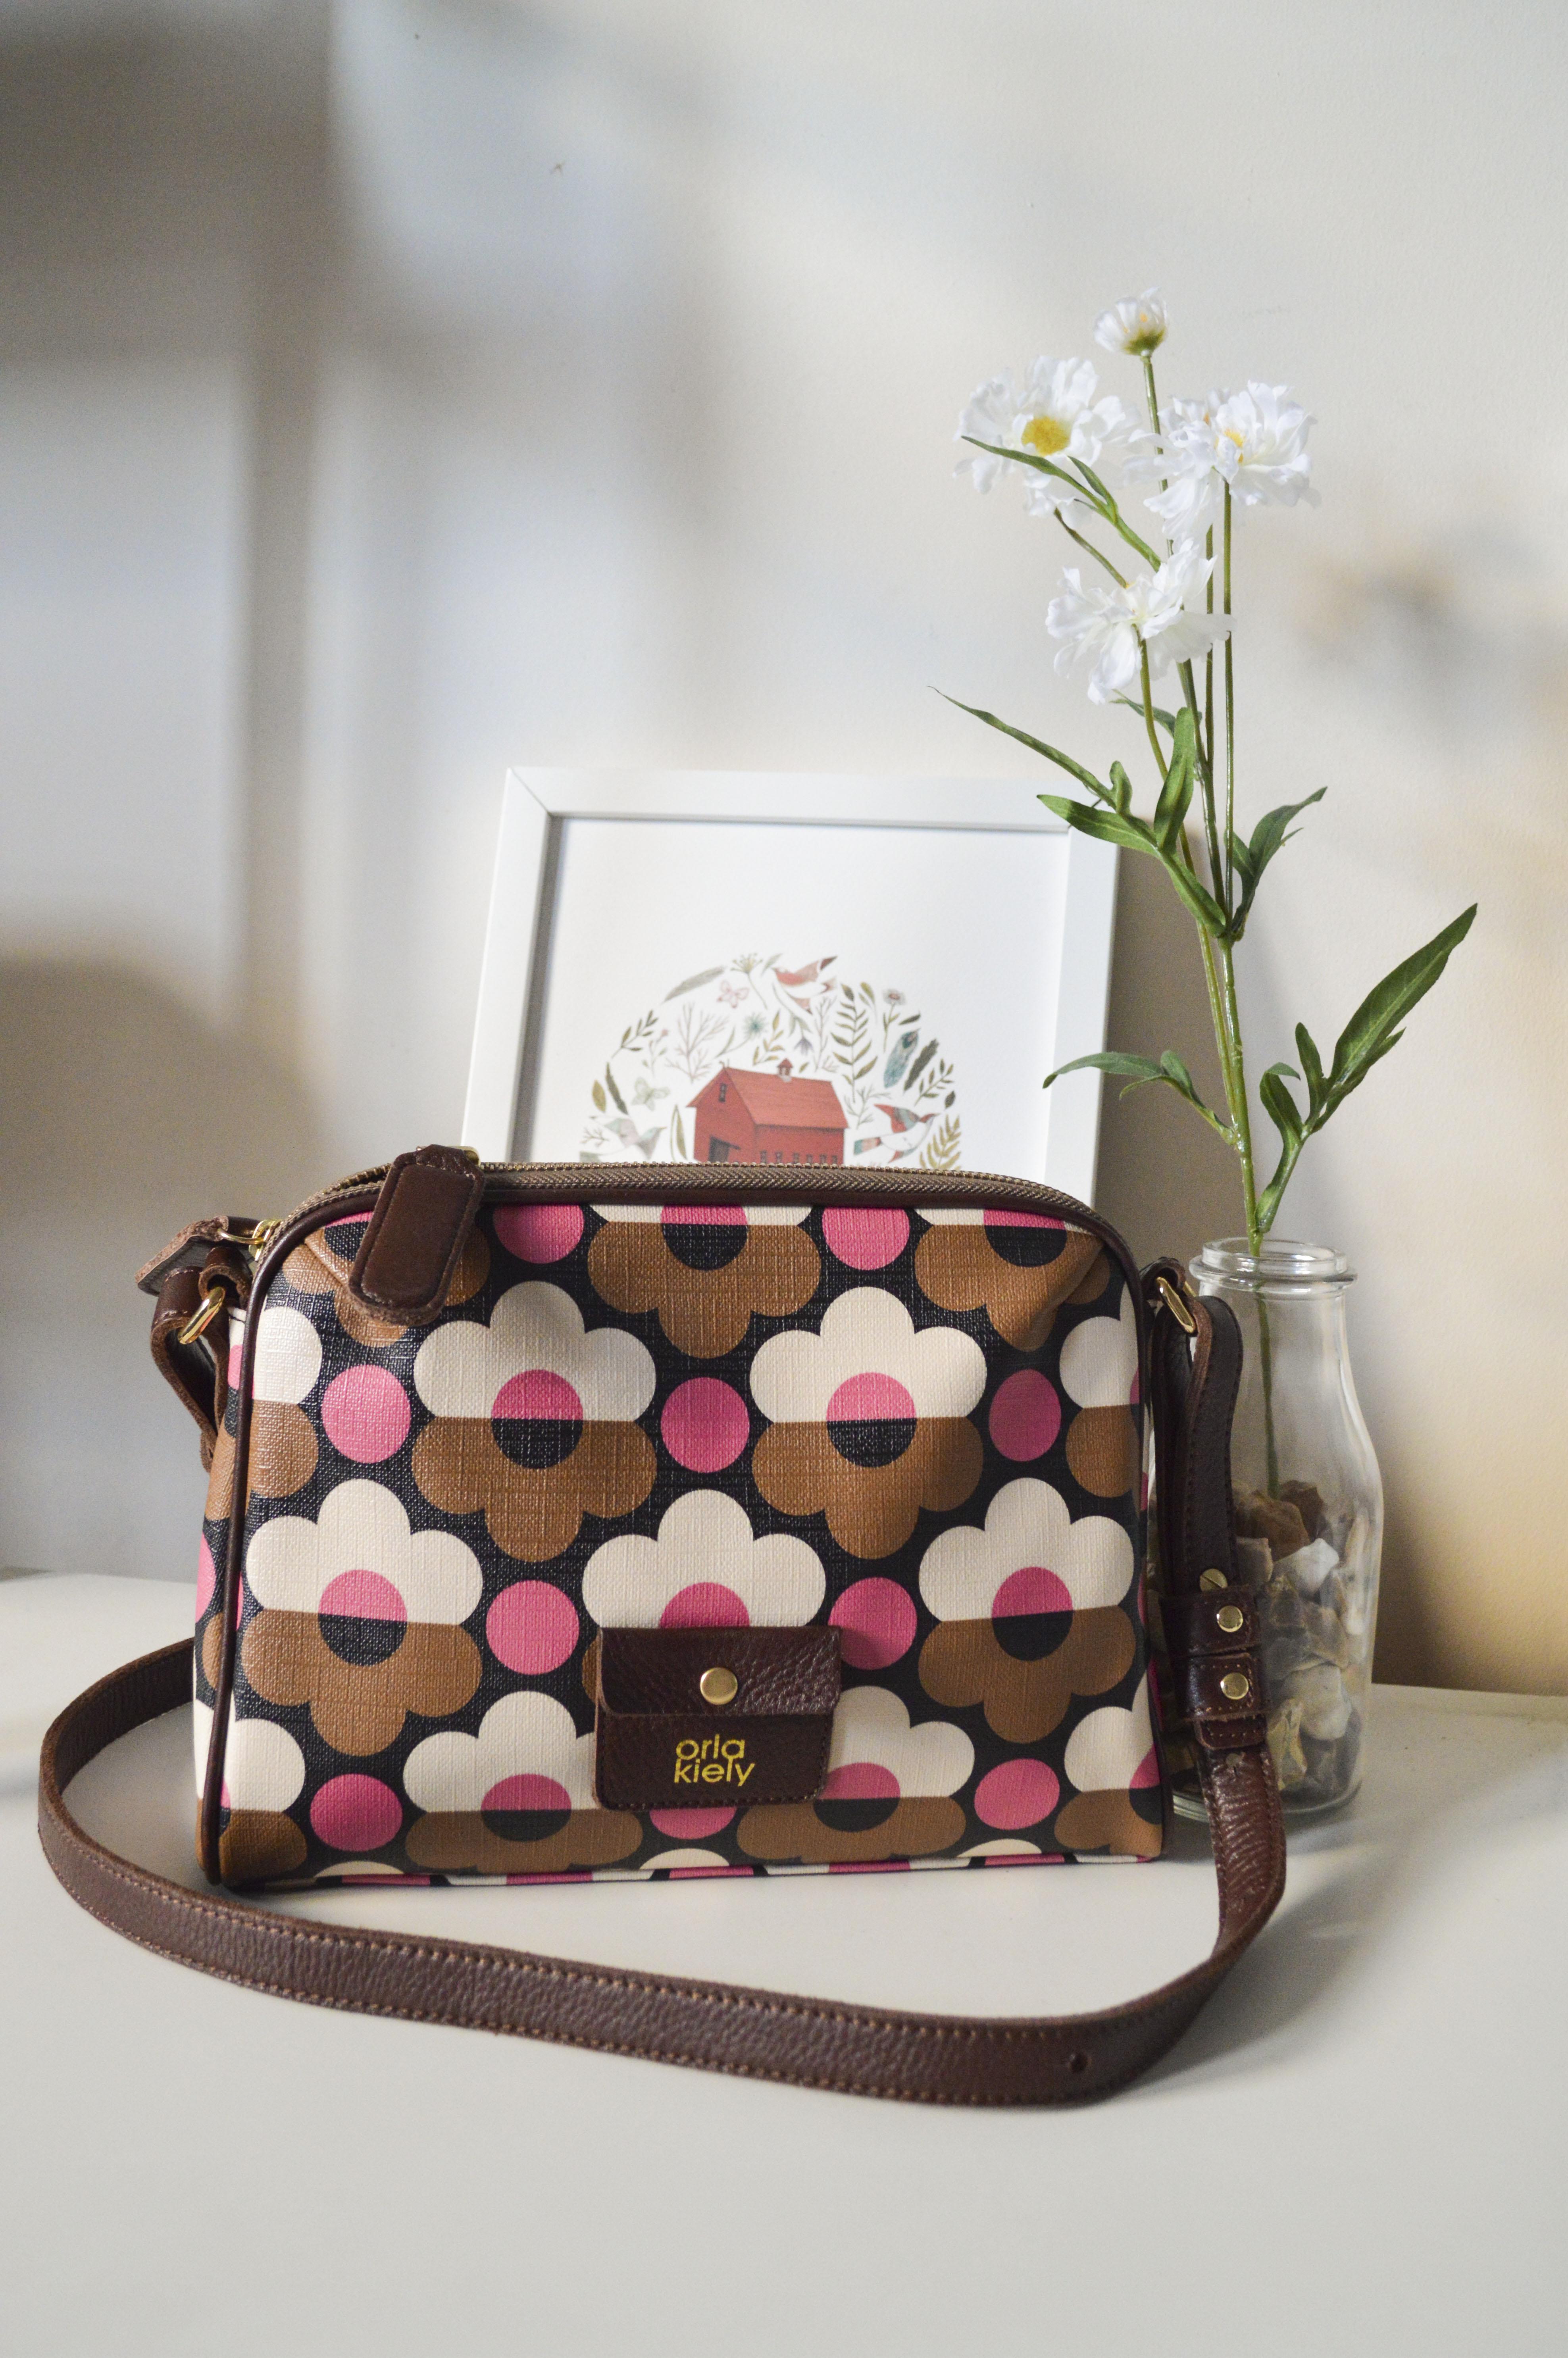 Orla_kiely_handbag